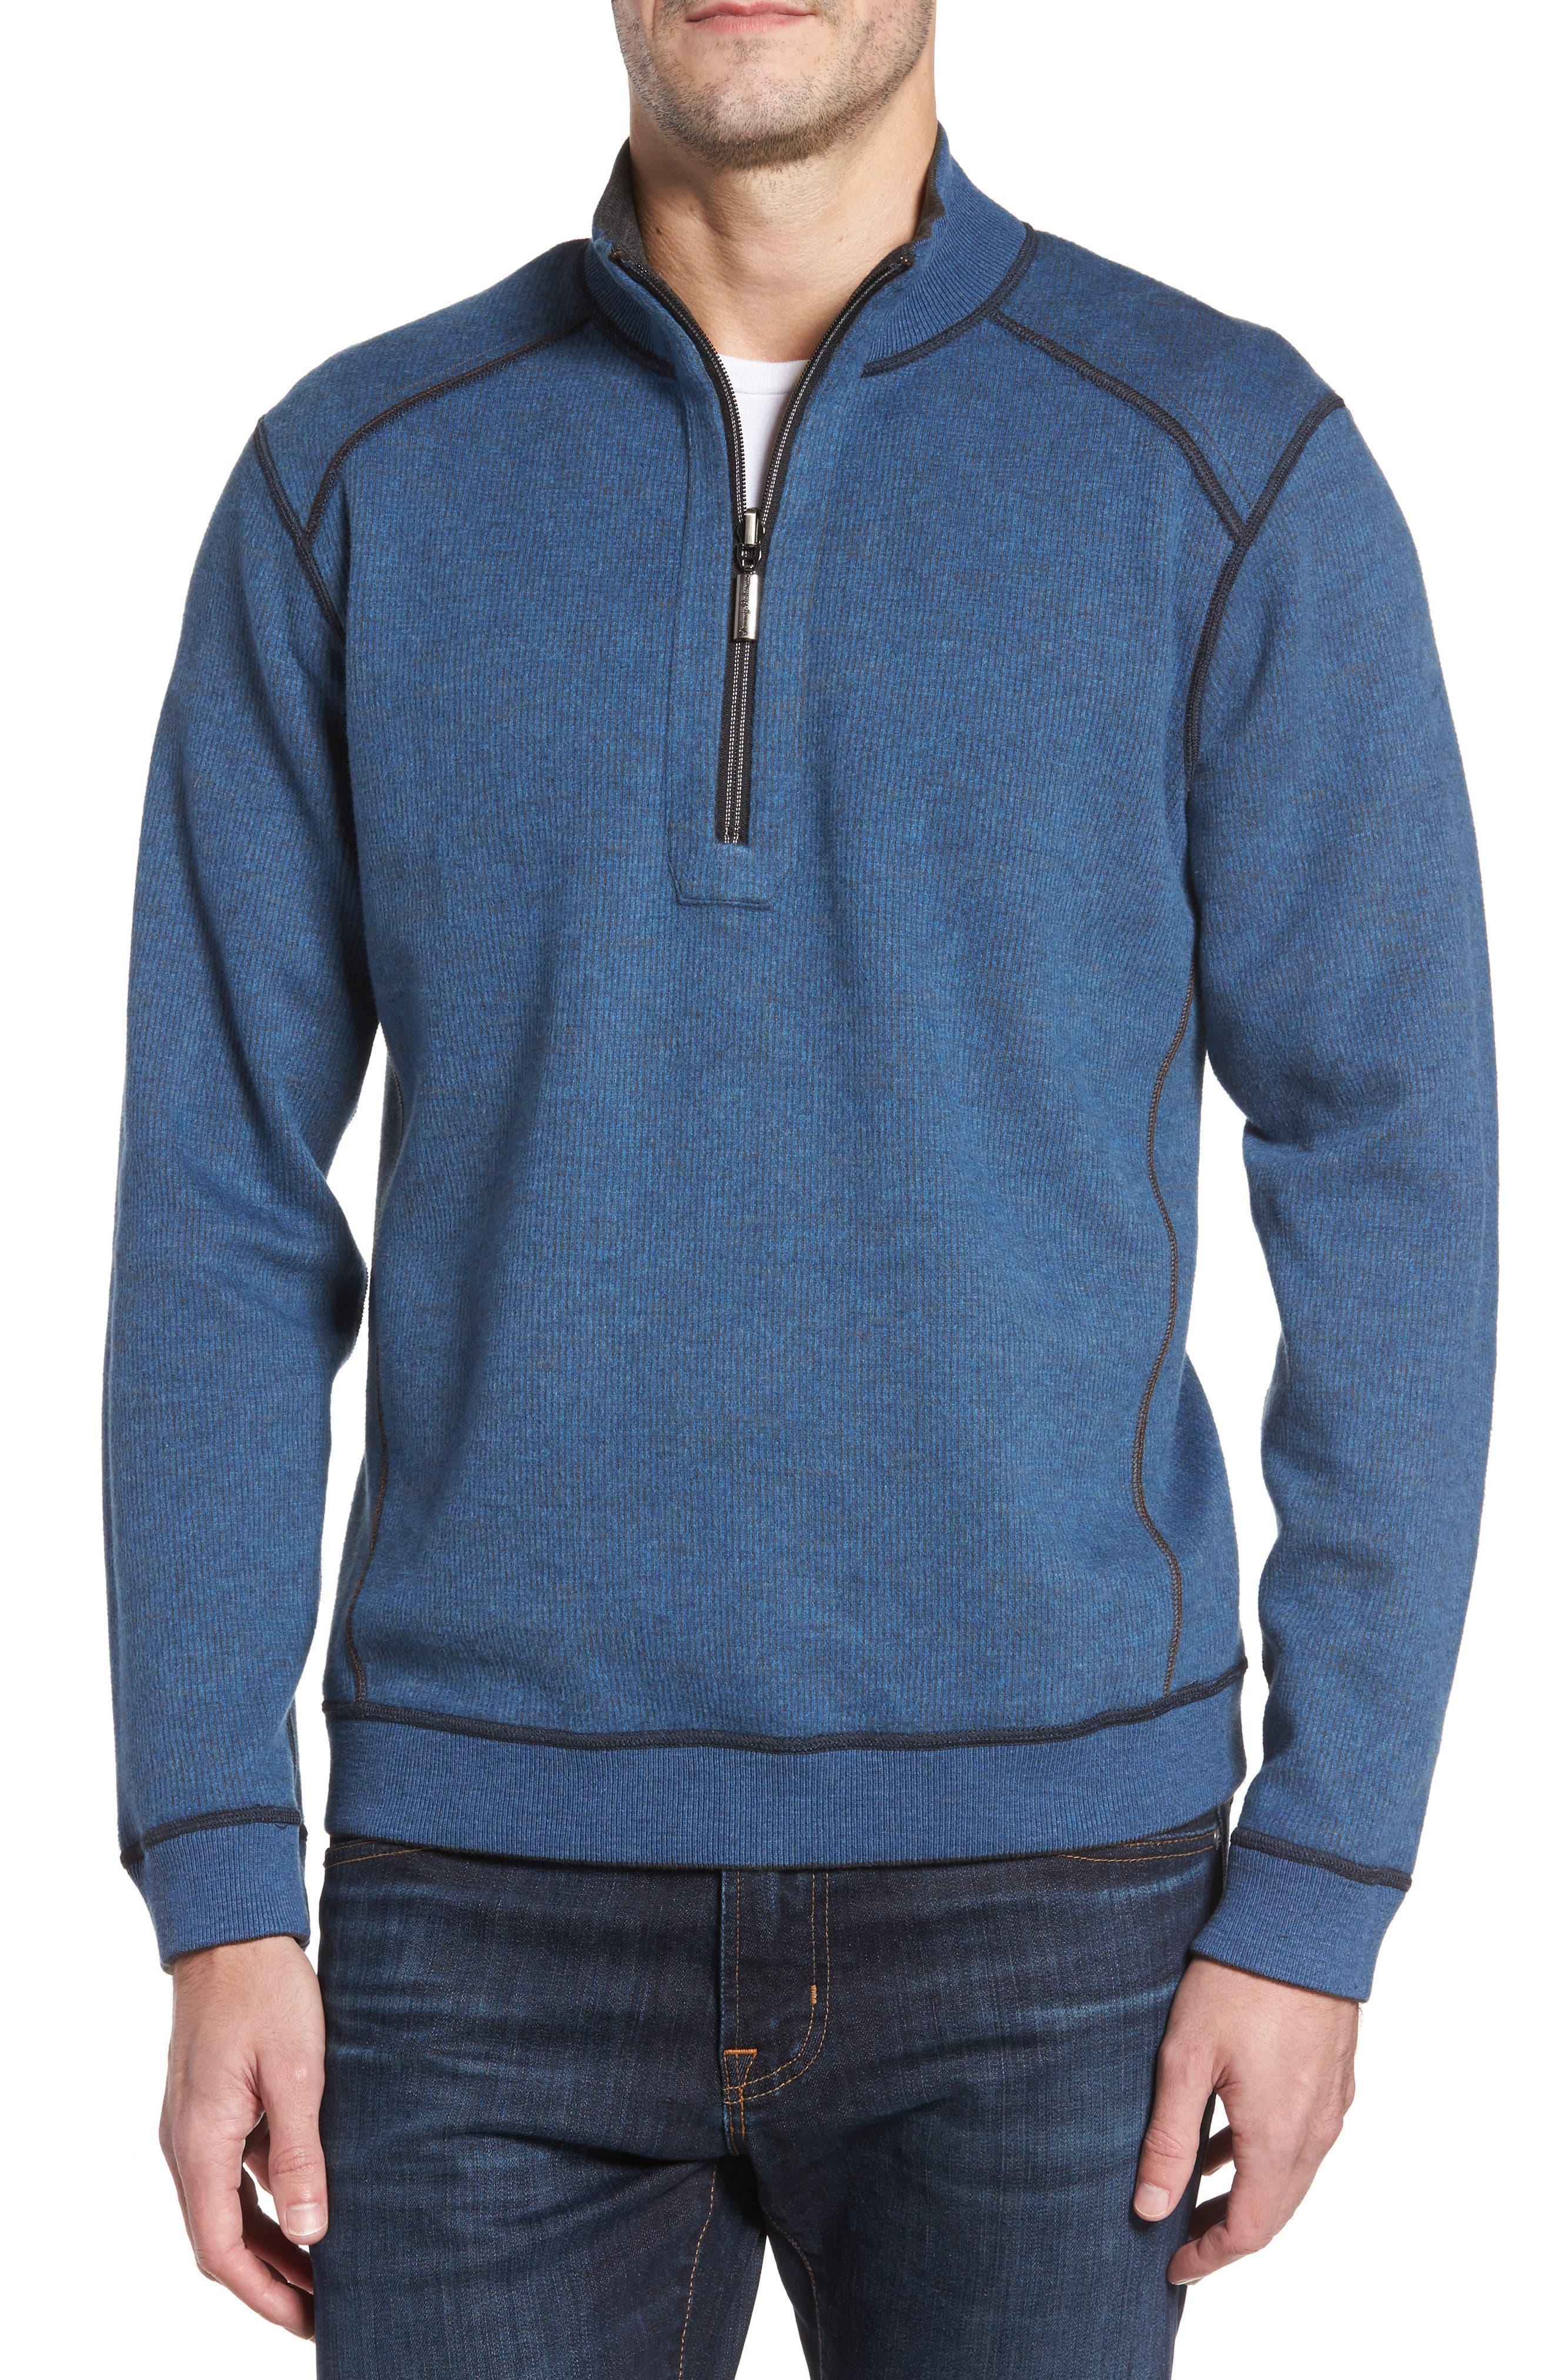 Flipsider Half Zip Reversible Sweatshirt,                             Alternate thumbnail 4, color,                             003